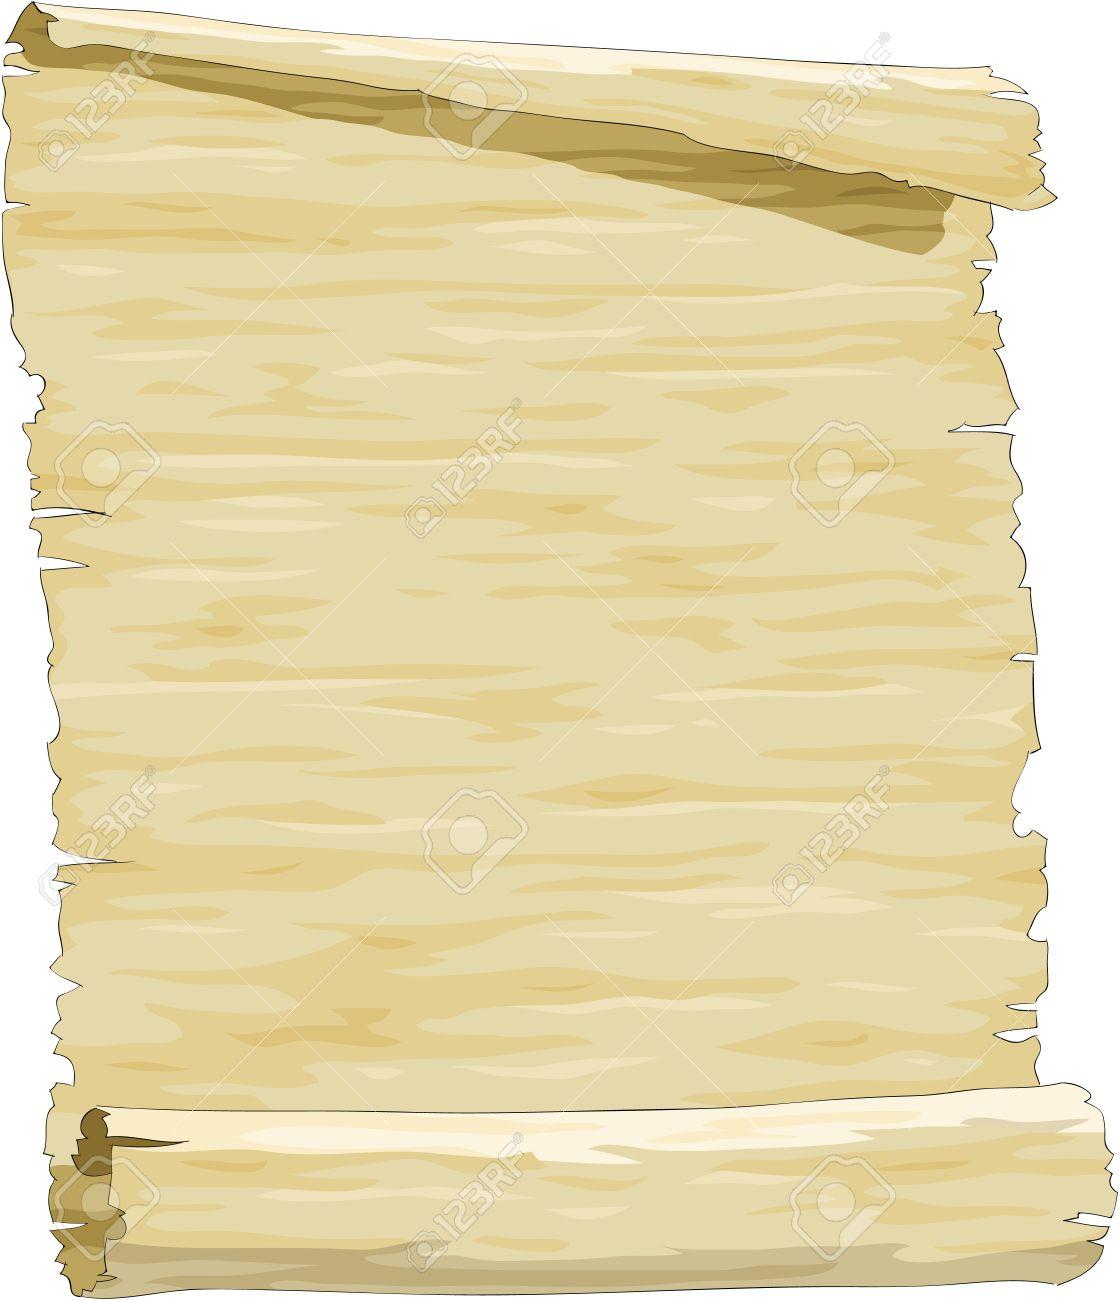 Old Cartoon Paper